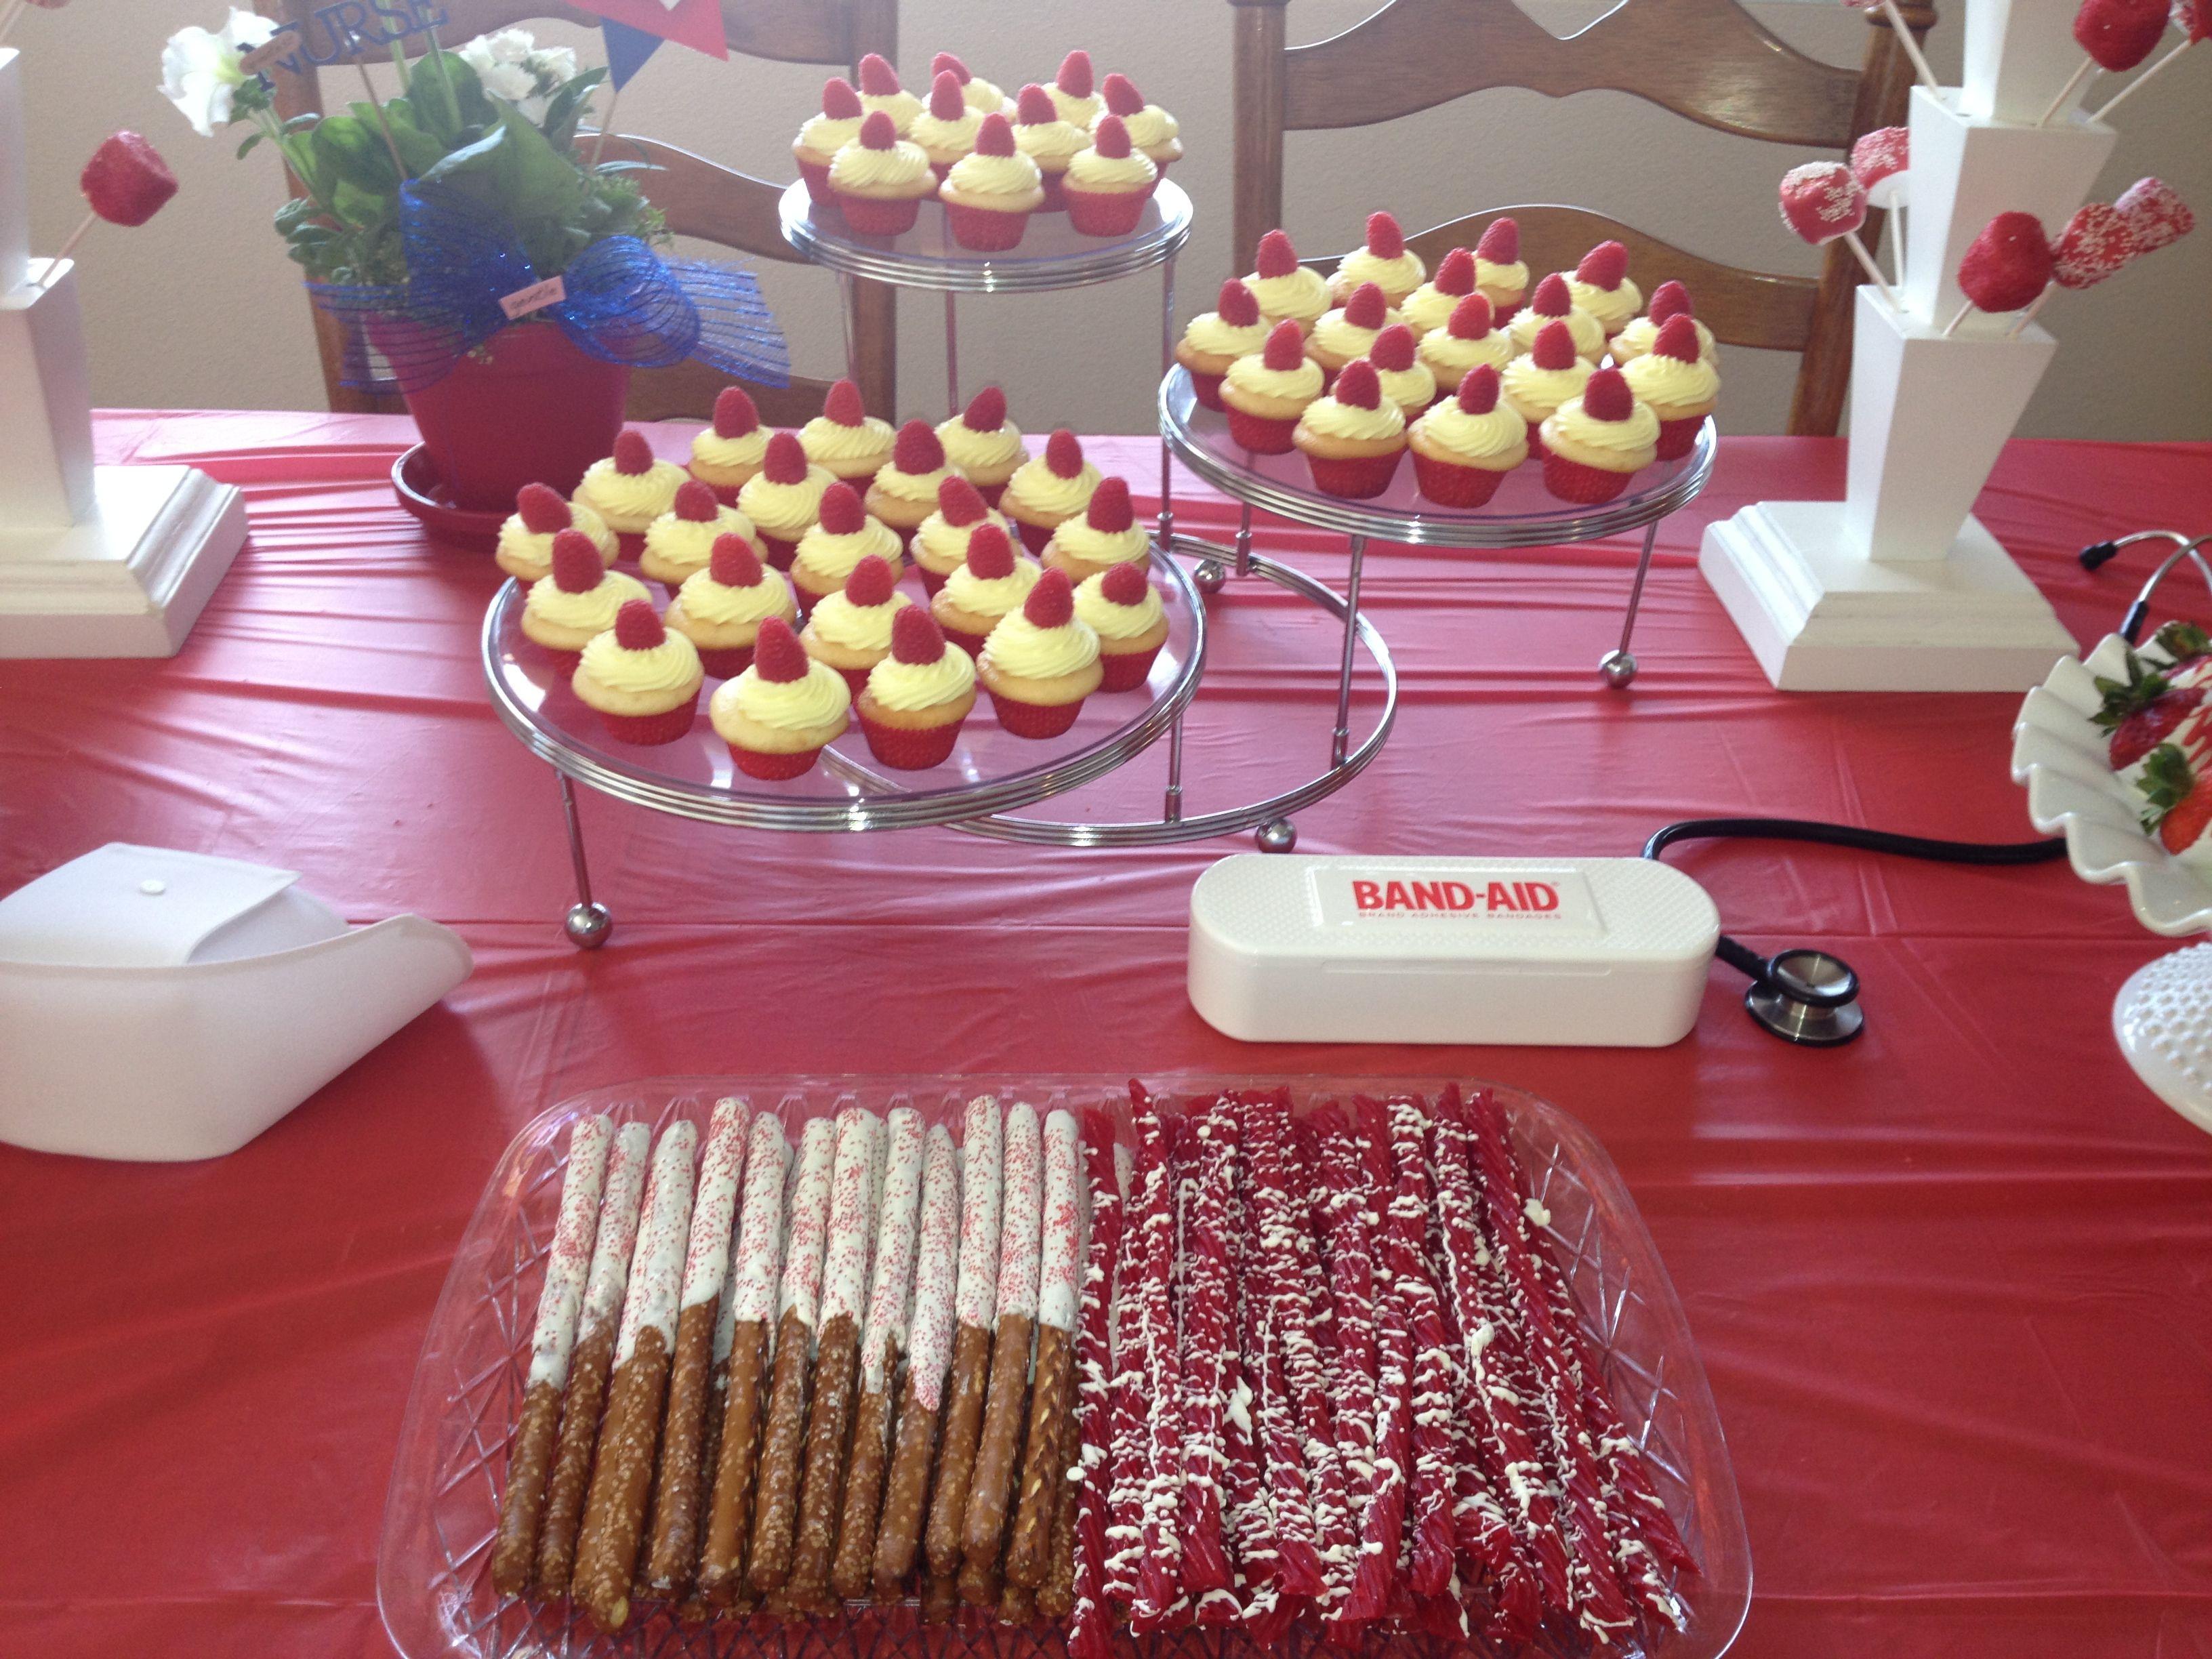 Dessert Table Ideas For Graduation Party  Dessert table for nursing graduation party